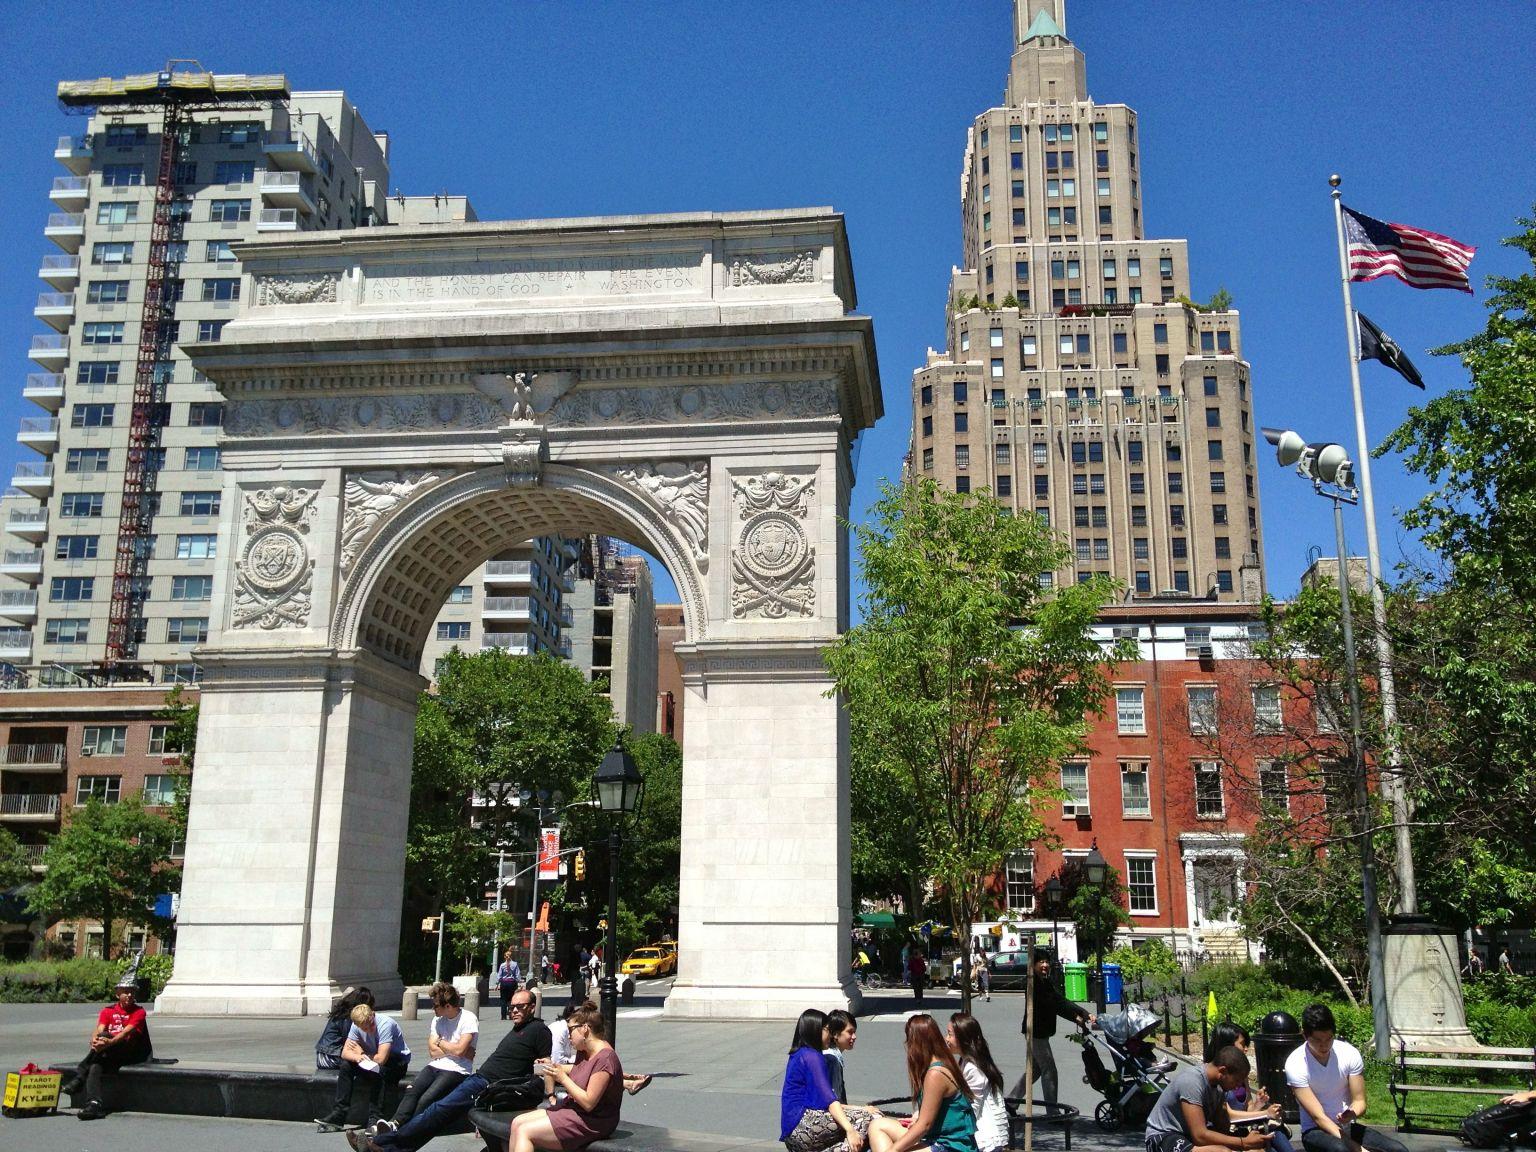 Pushing Privatized Partnership Agenda At New York City S Public Parks